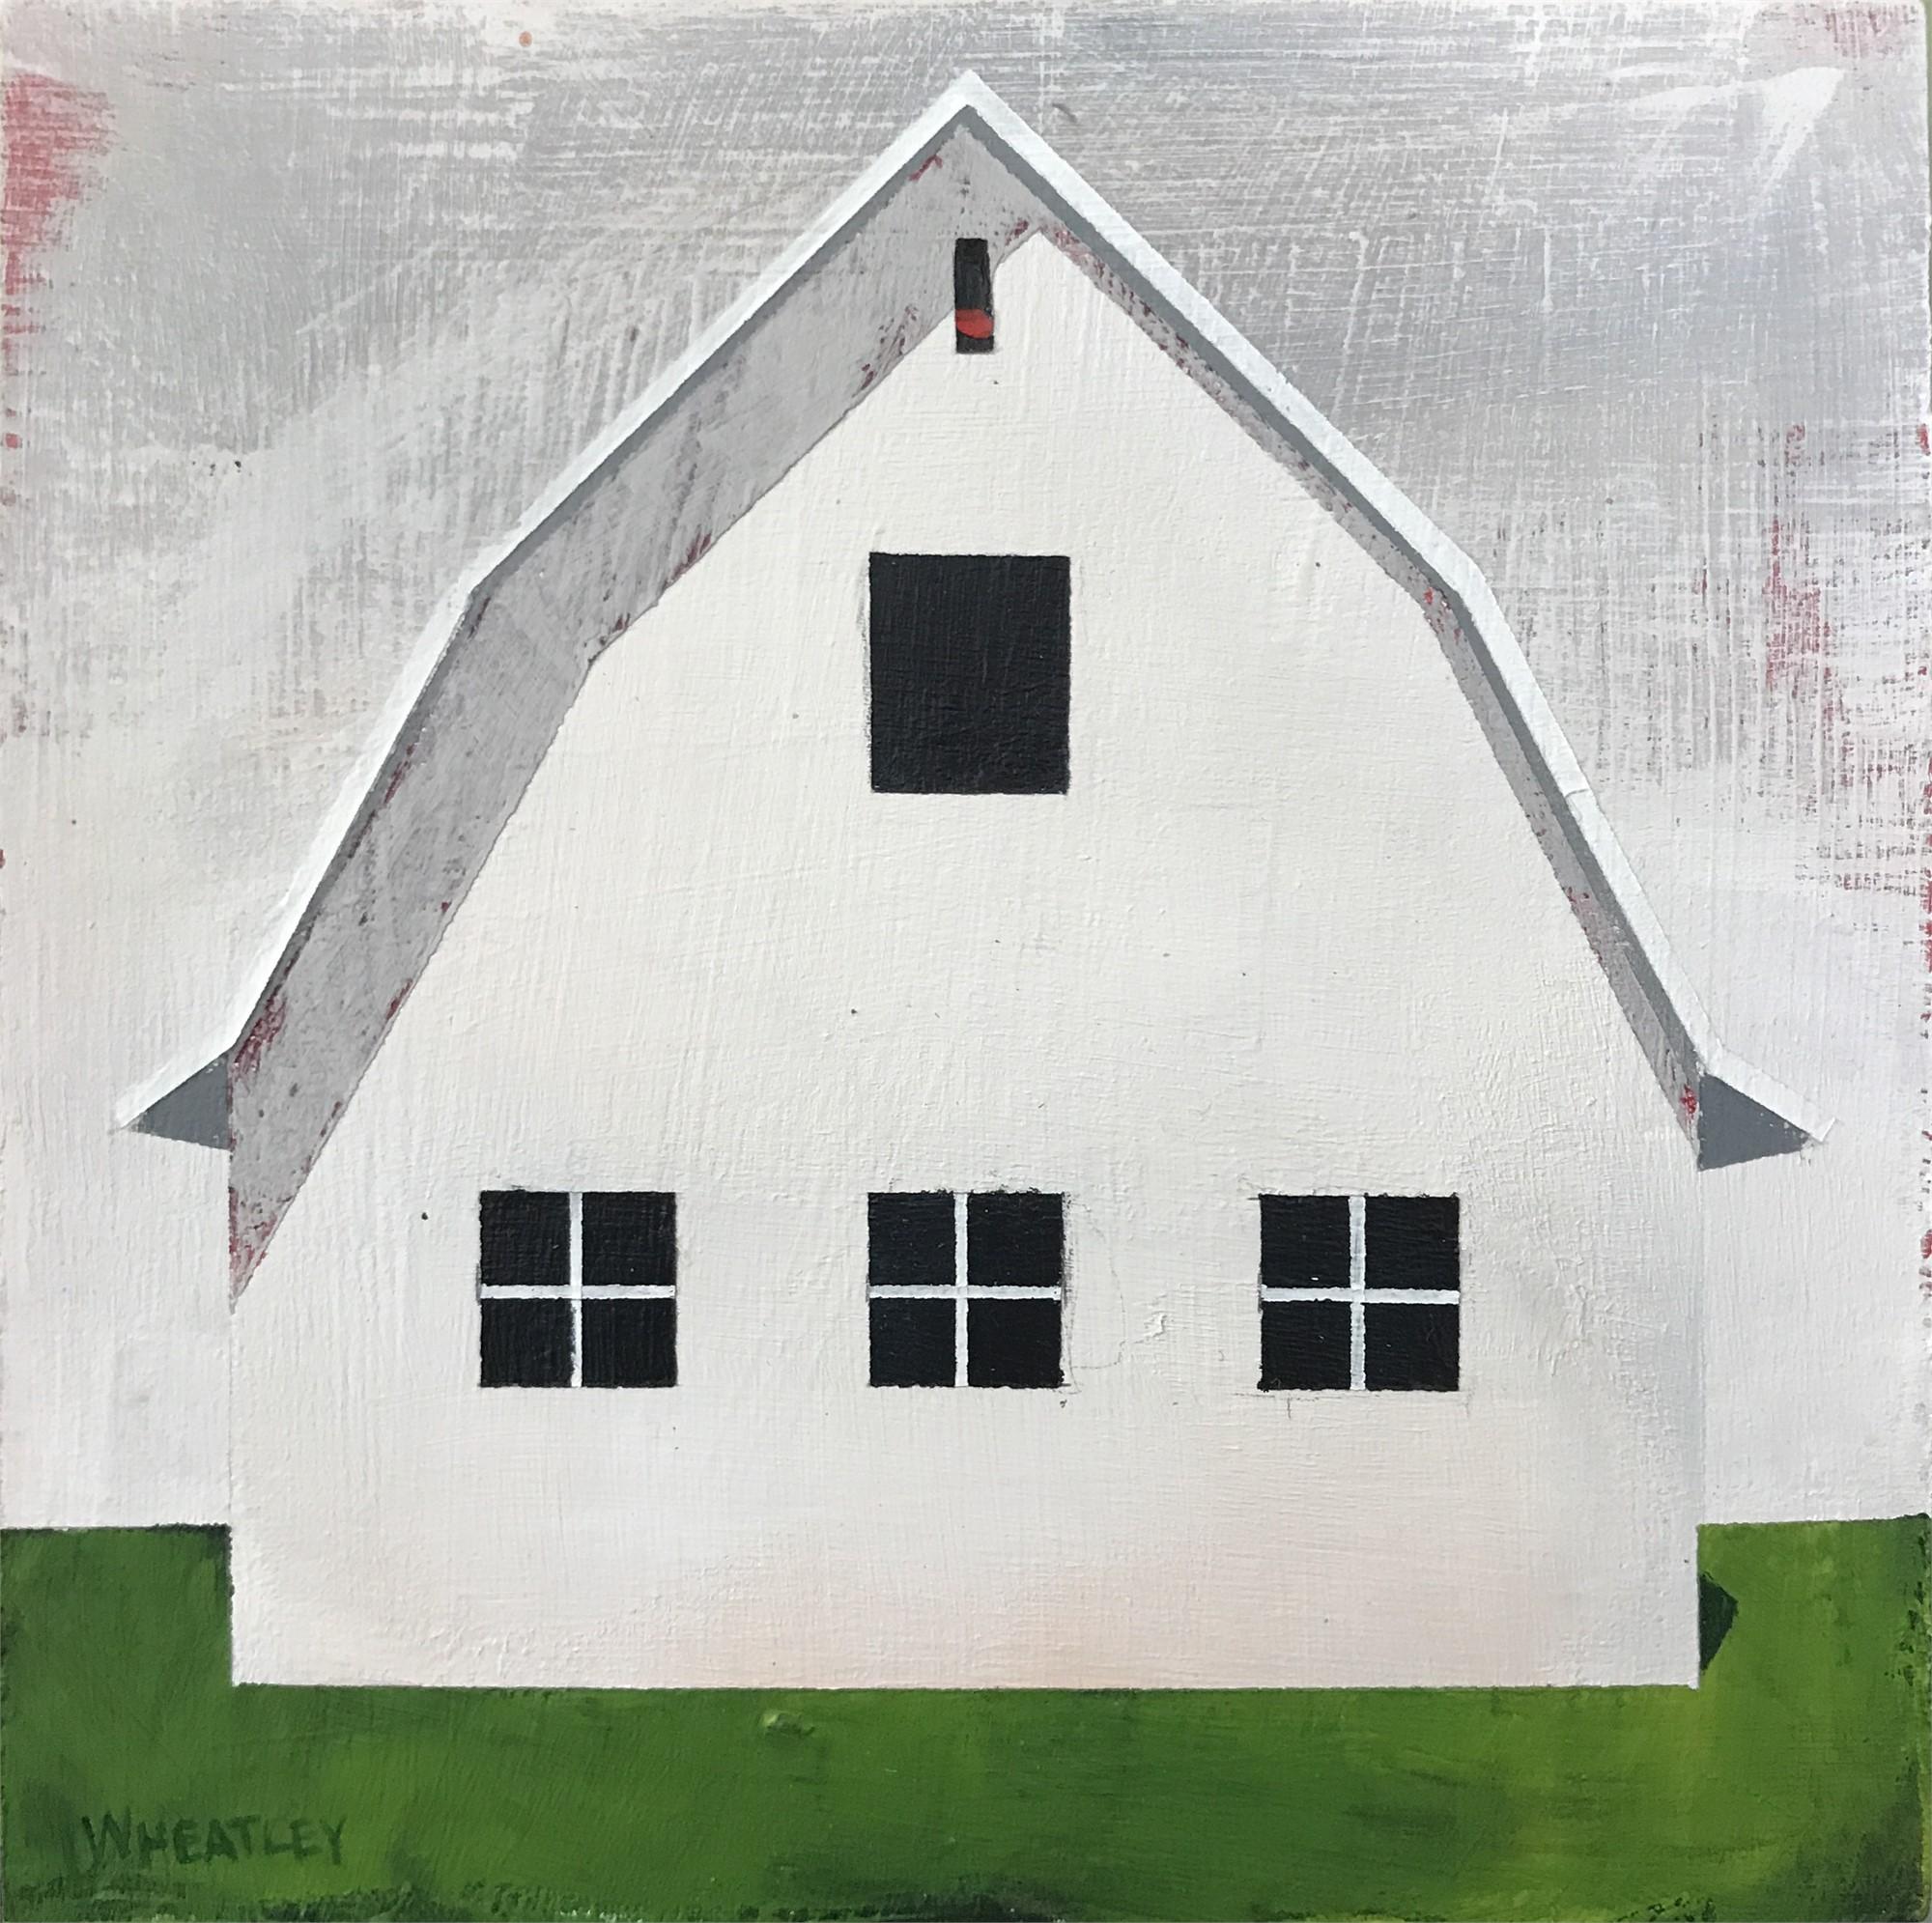 White Barn IV by Justin Wheatley